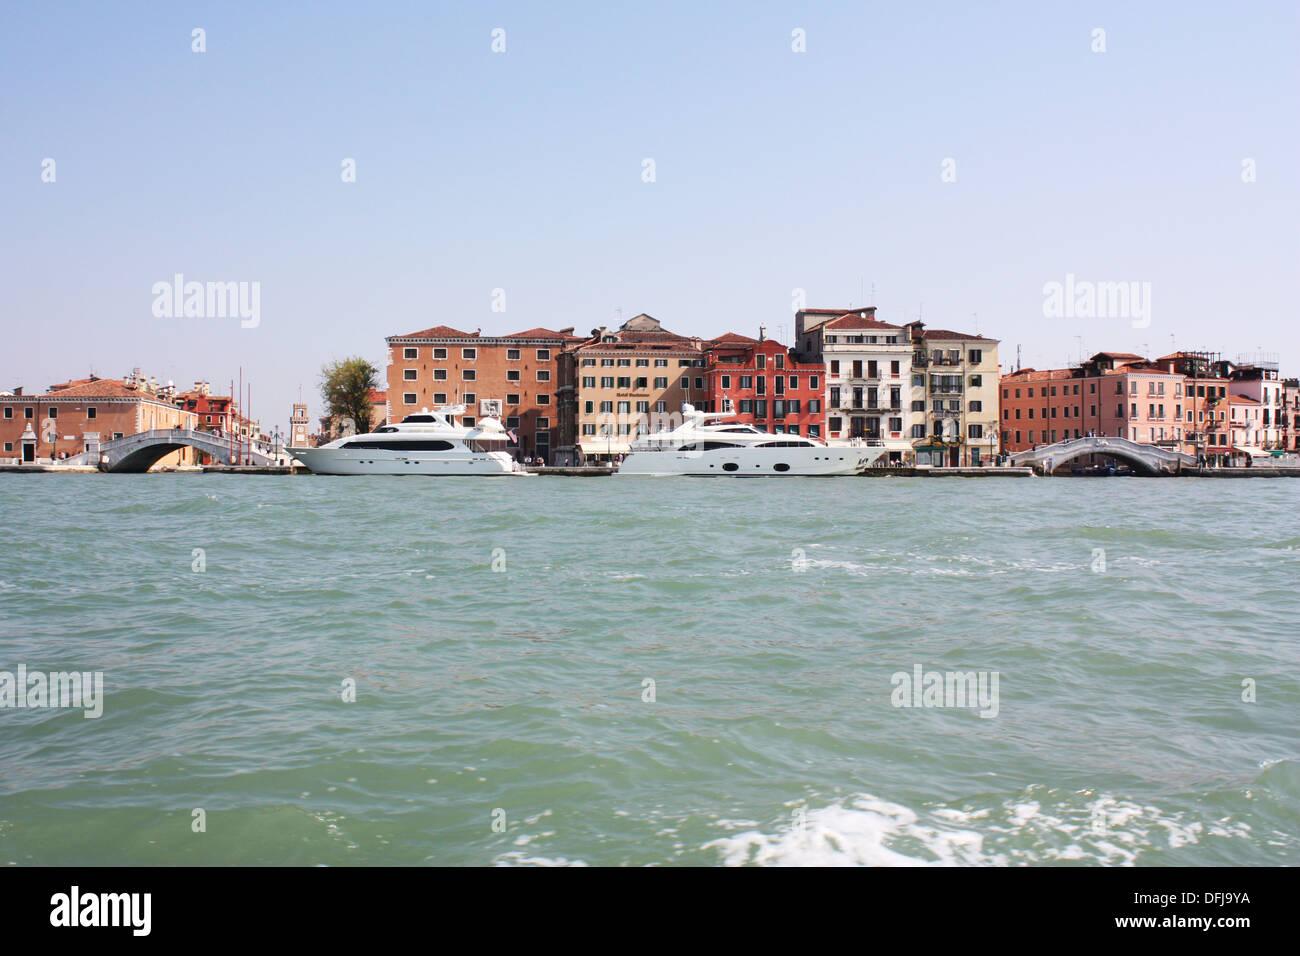 Ferry in Venice, Italy Stock Photo